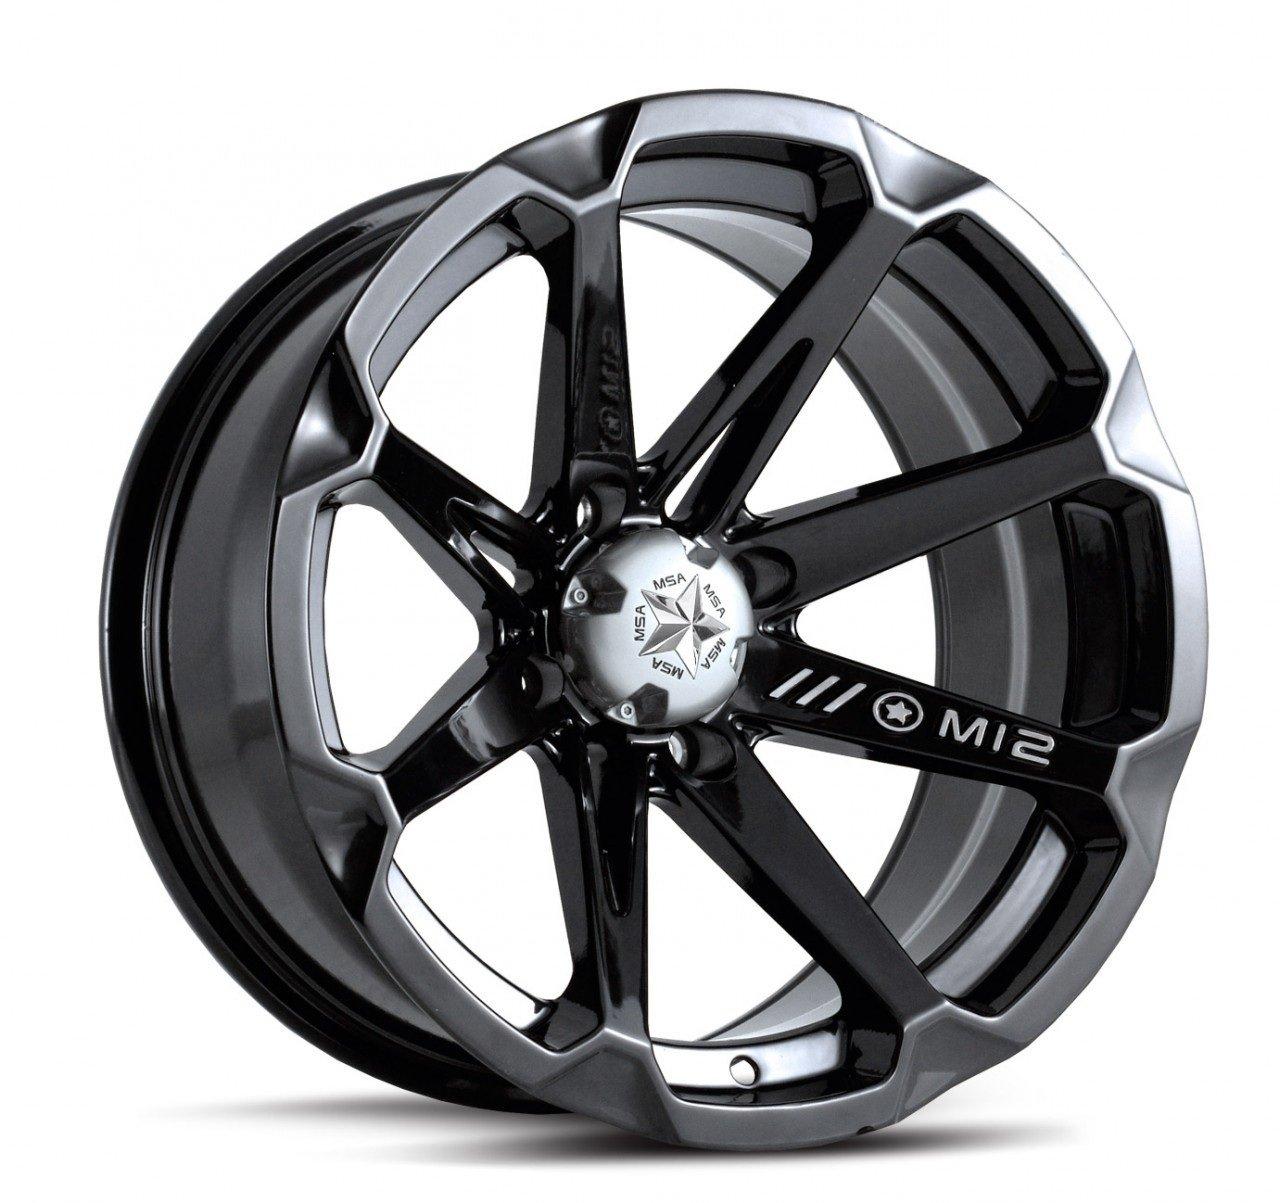 MSA Black Diesel 14 ATV Wheels 27 MotoHammer Tires 4x156 Bolt Pattern 10mmx1.25 Lug Kit 9 Items Bundle